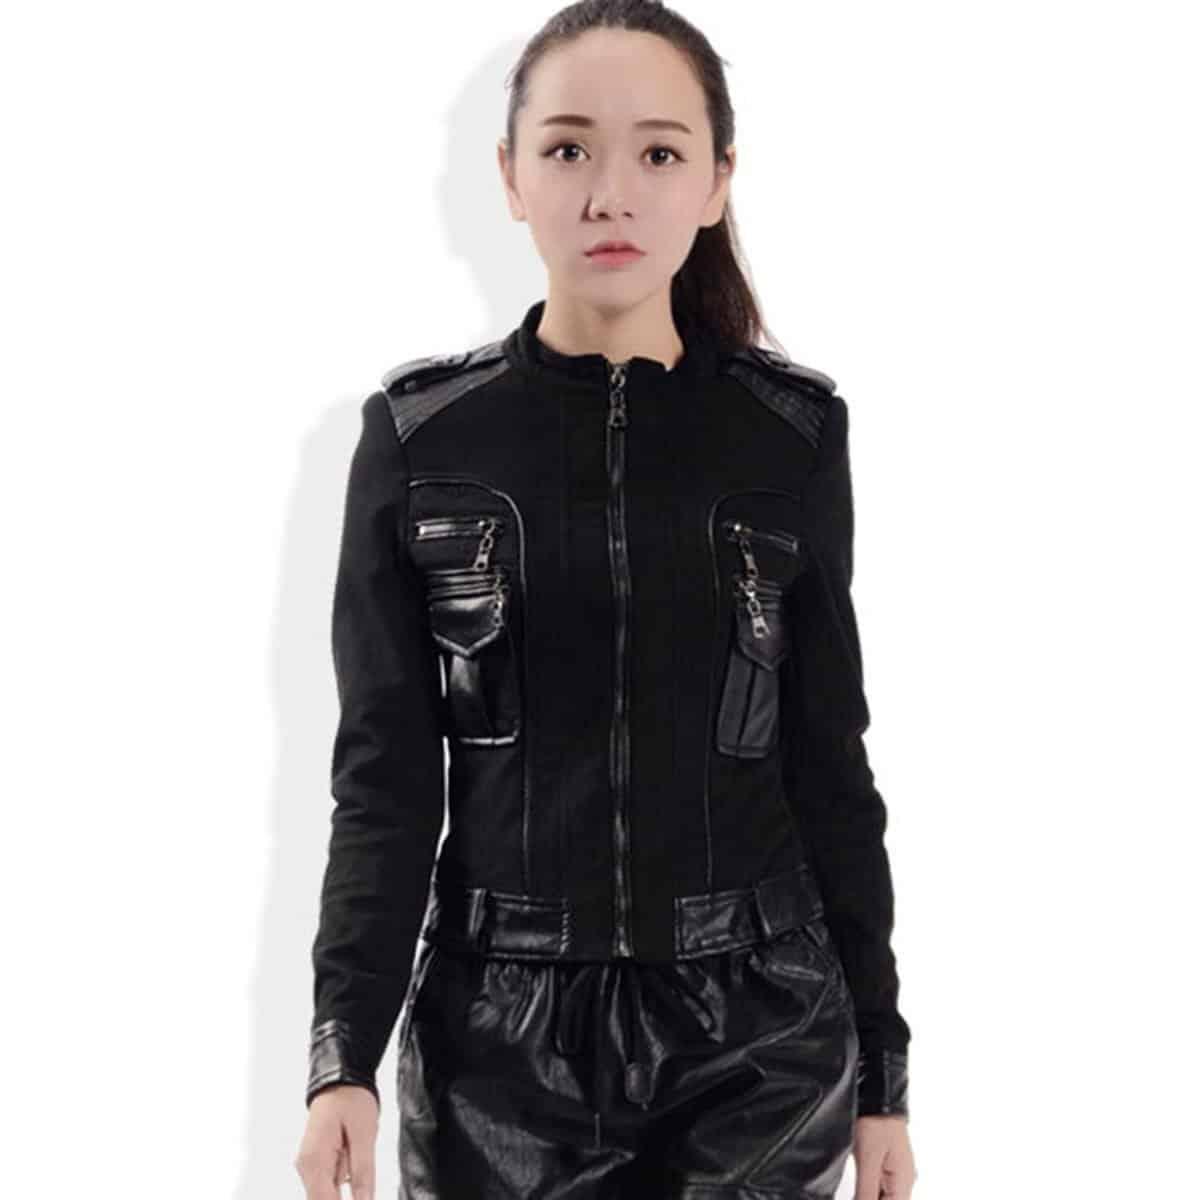 Gothic Zippered Faux Leather Coat - The Black Ravens